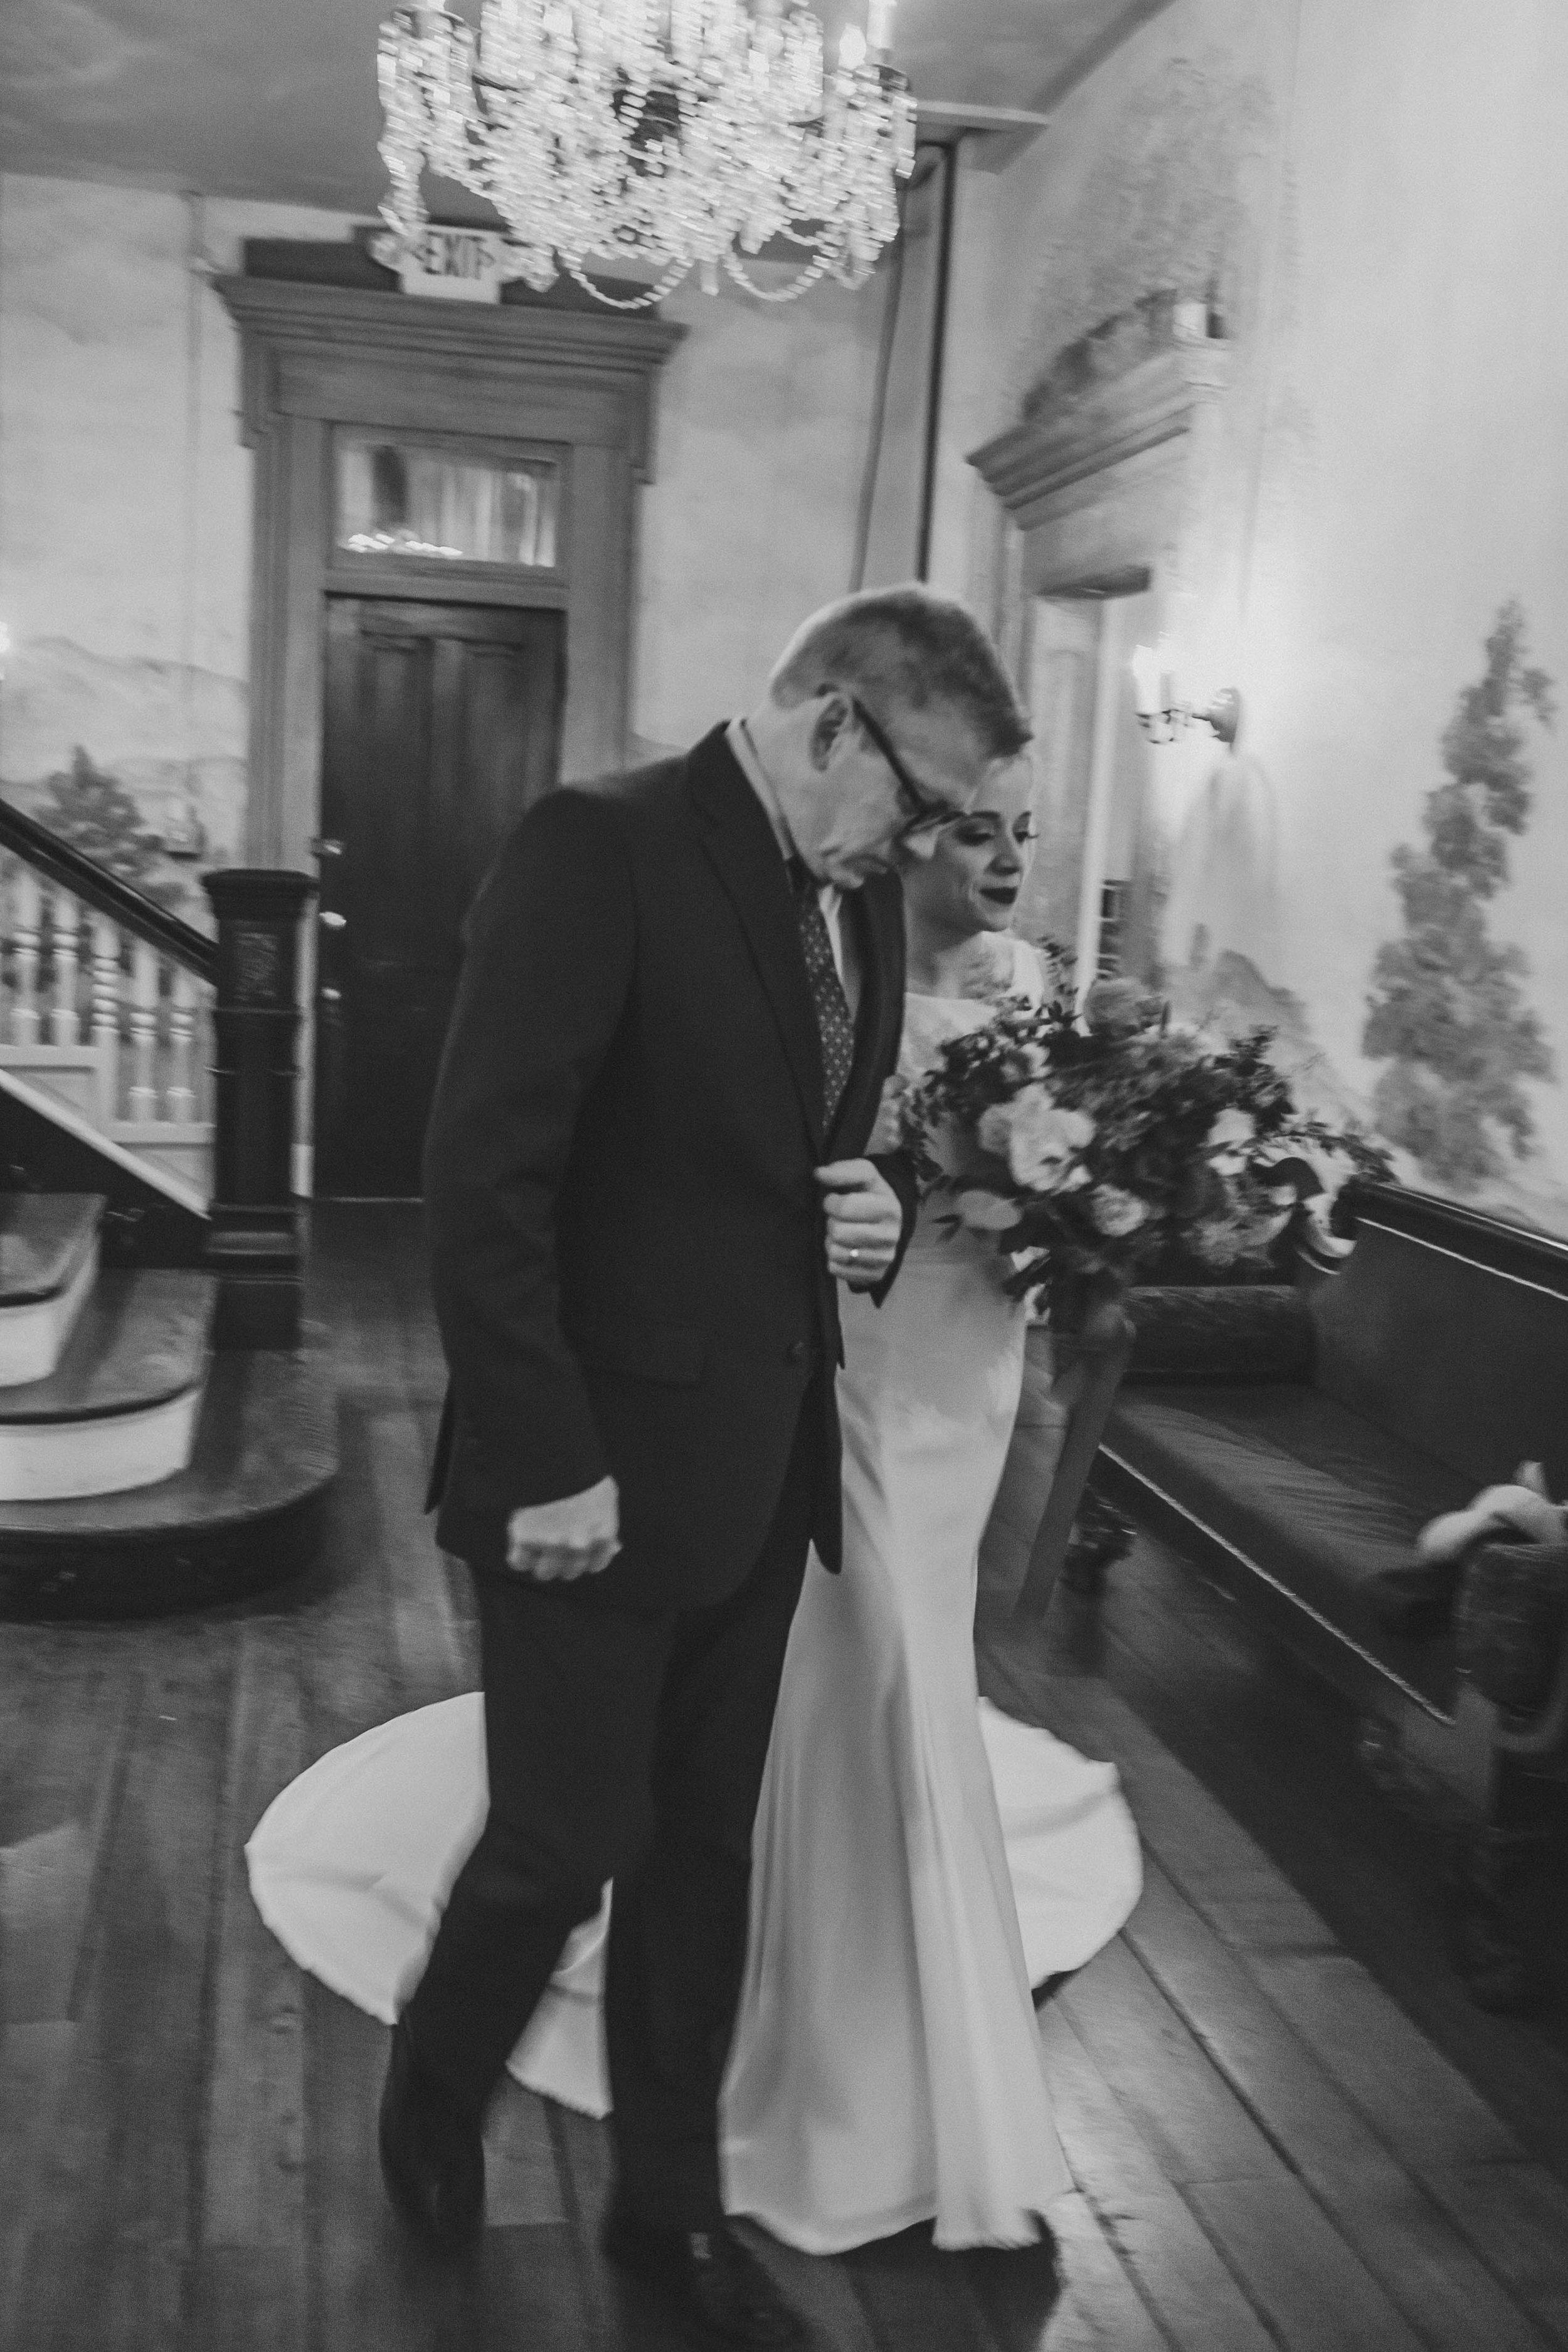 Charis_Lauren_Romantic_Wedding_Photographer_Nashville_0782.jpg